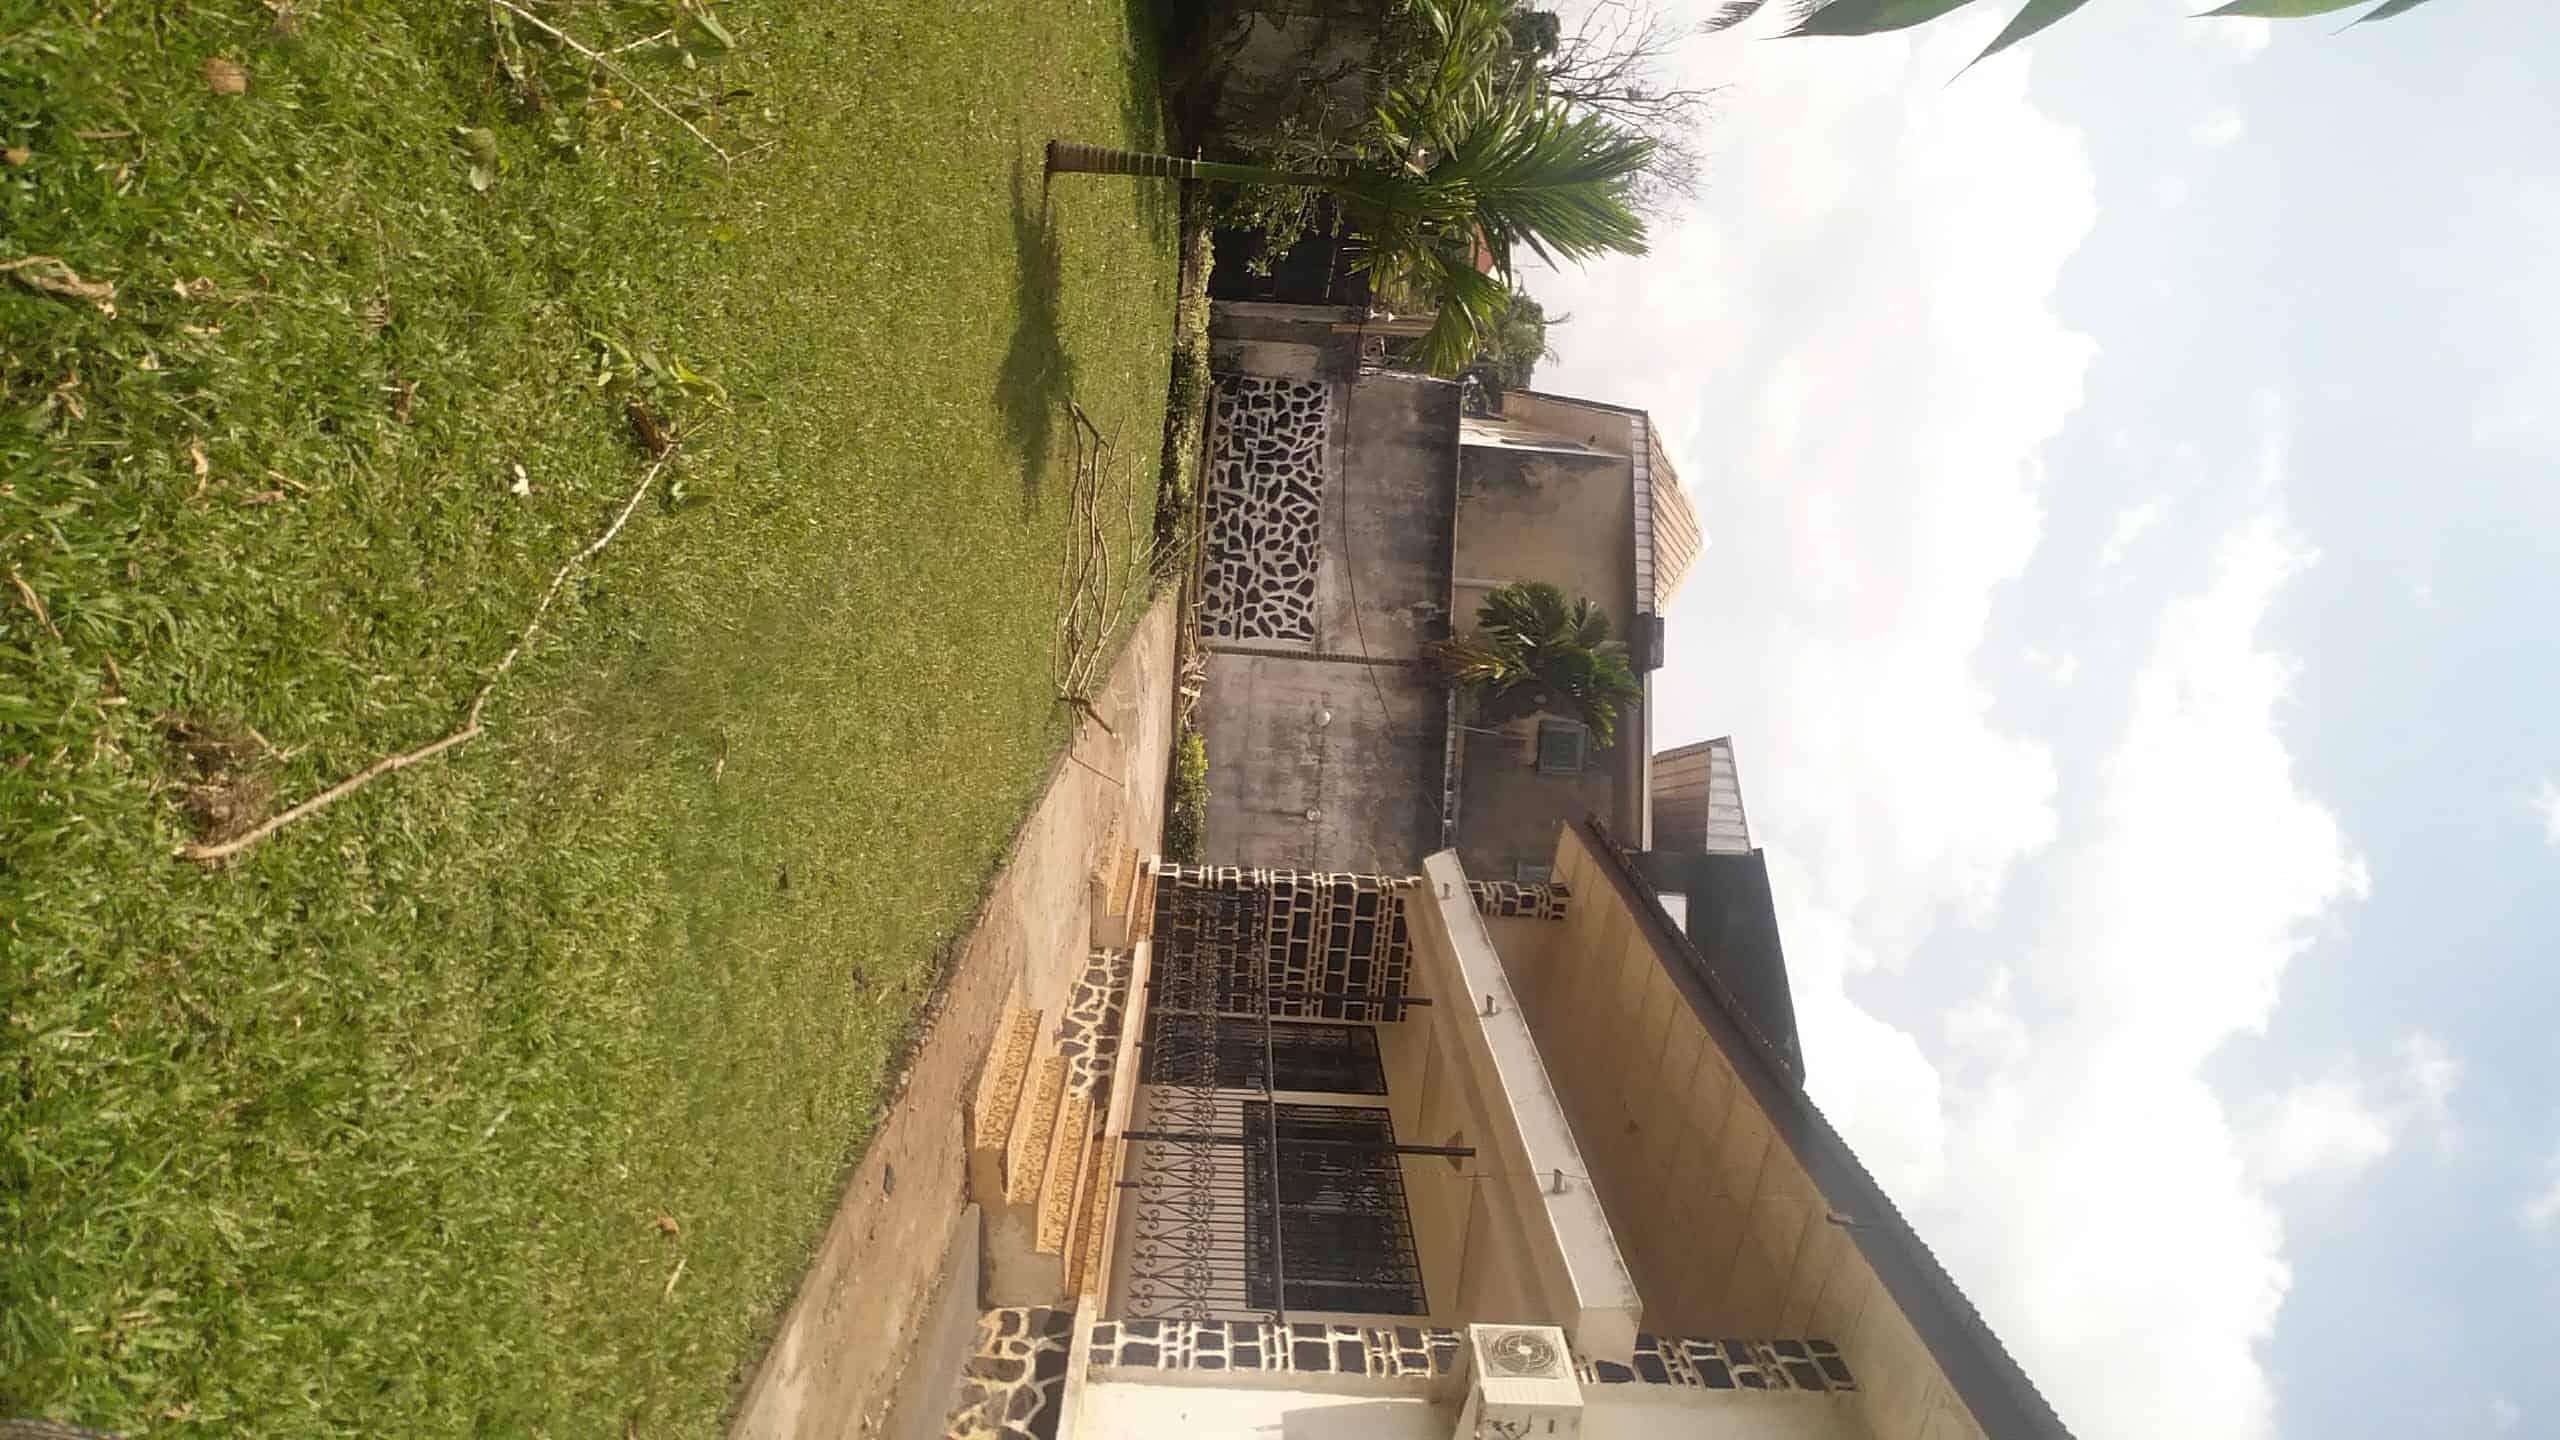 House (Villa) to rent - Yaoundé, Bastos, bastos - 1 living room(s), 3 bedroom(s), 2 bathroom(s) - 550 000 FCFA / month